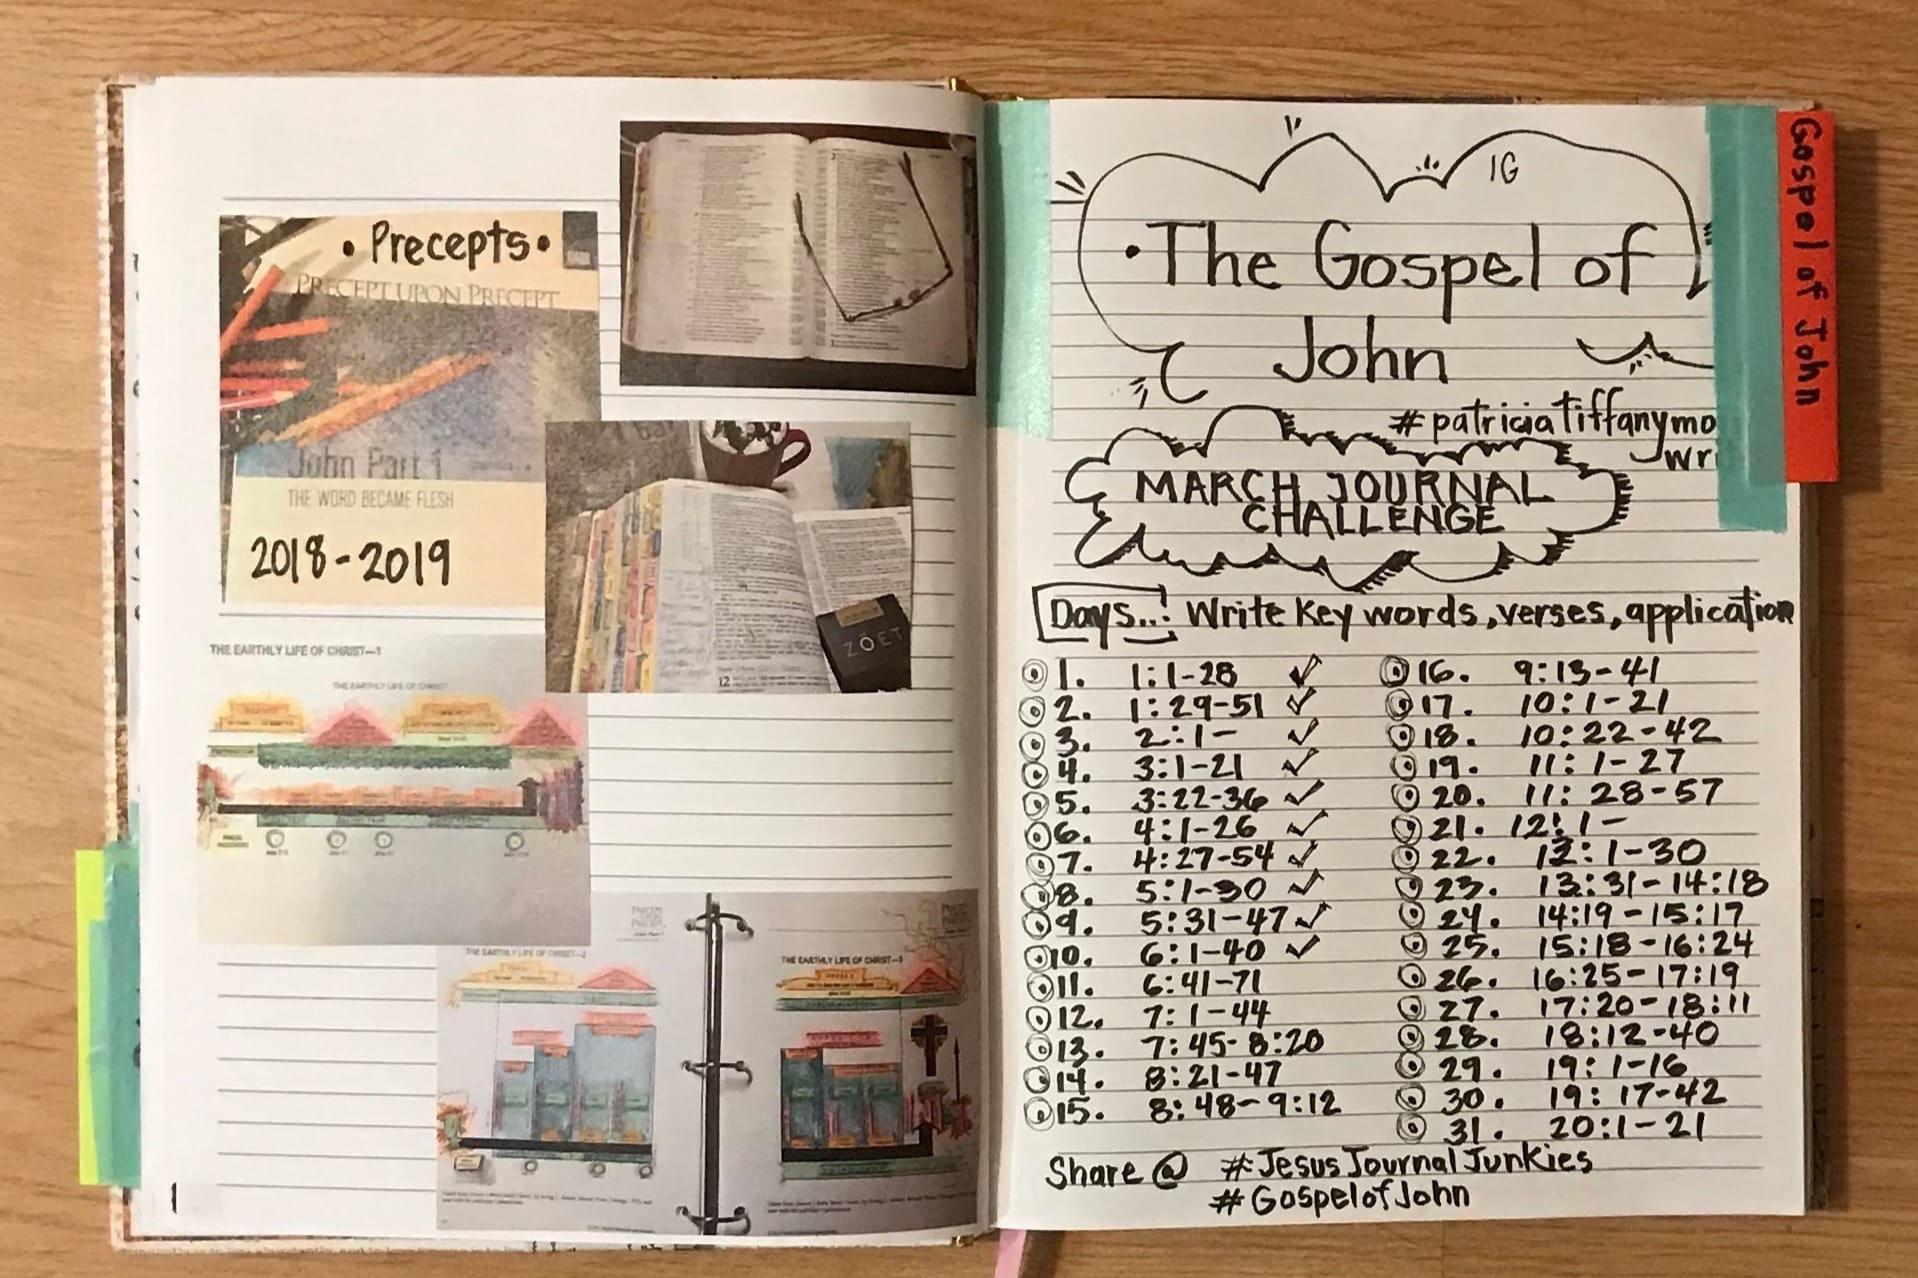 Instagram Author's Challenge 2019 and Precepts International Bible Study of the Gospel of John.